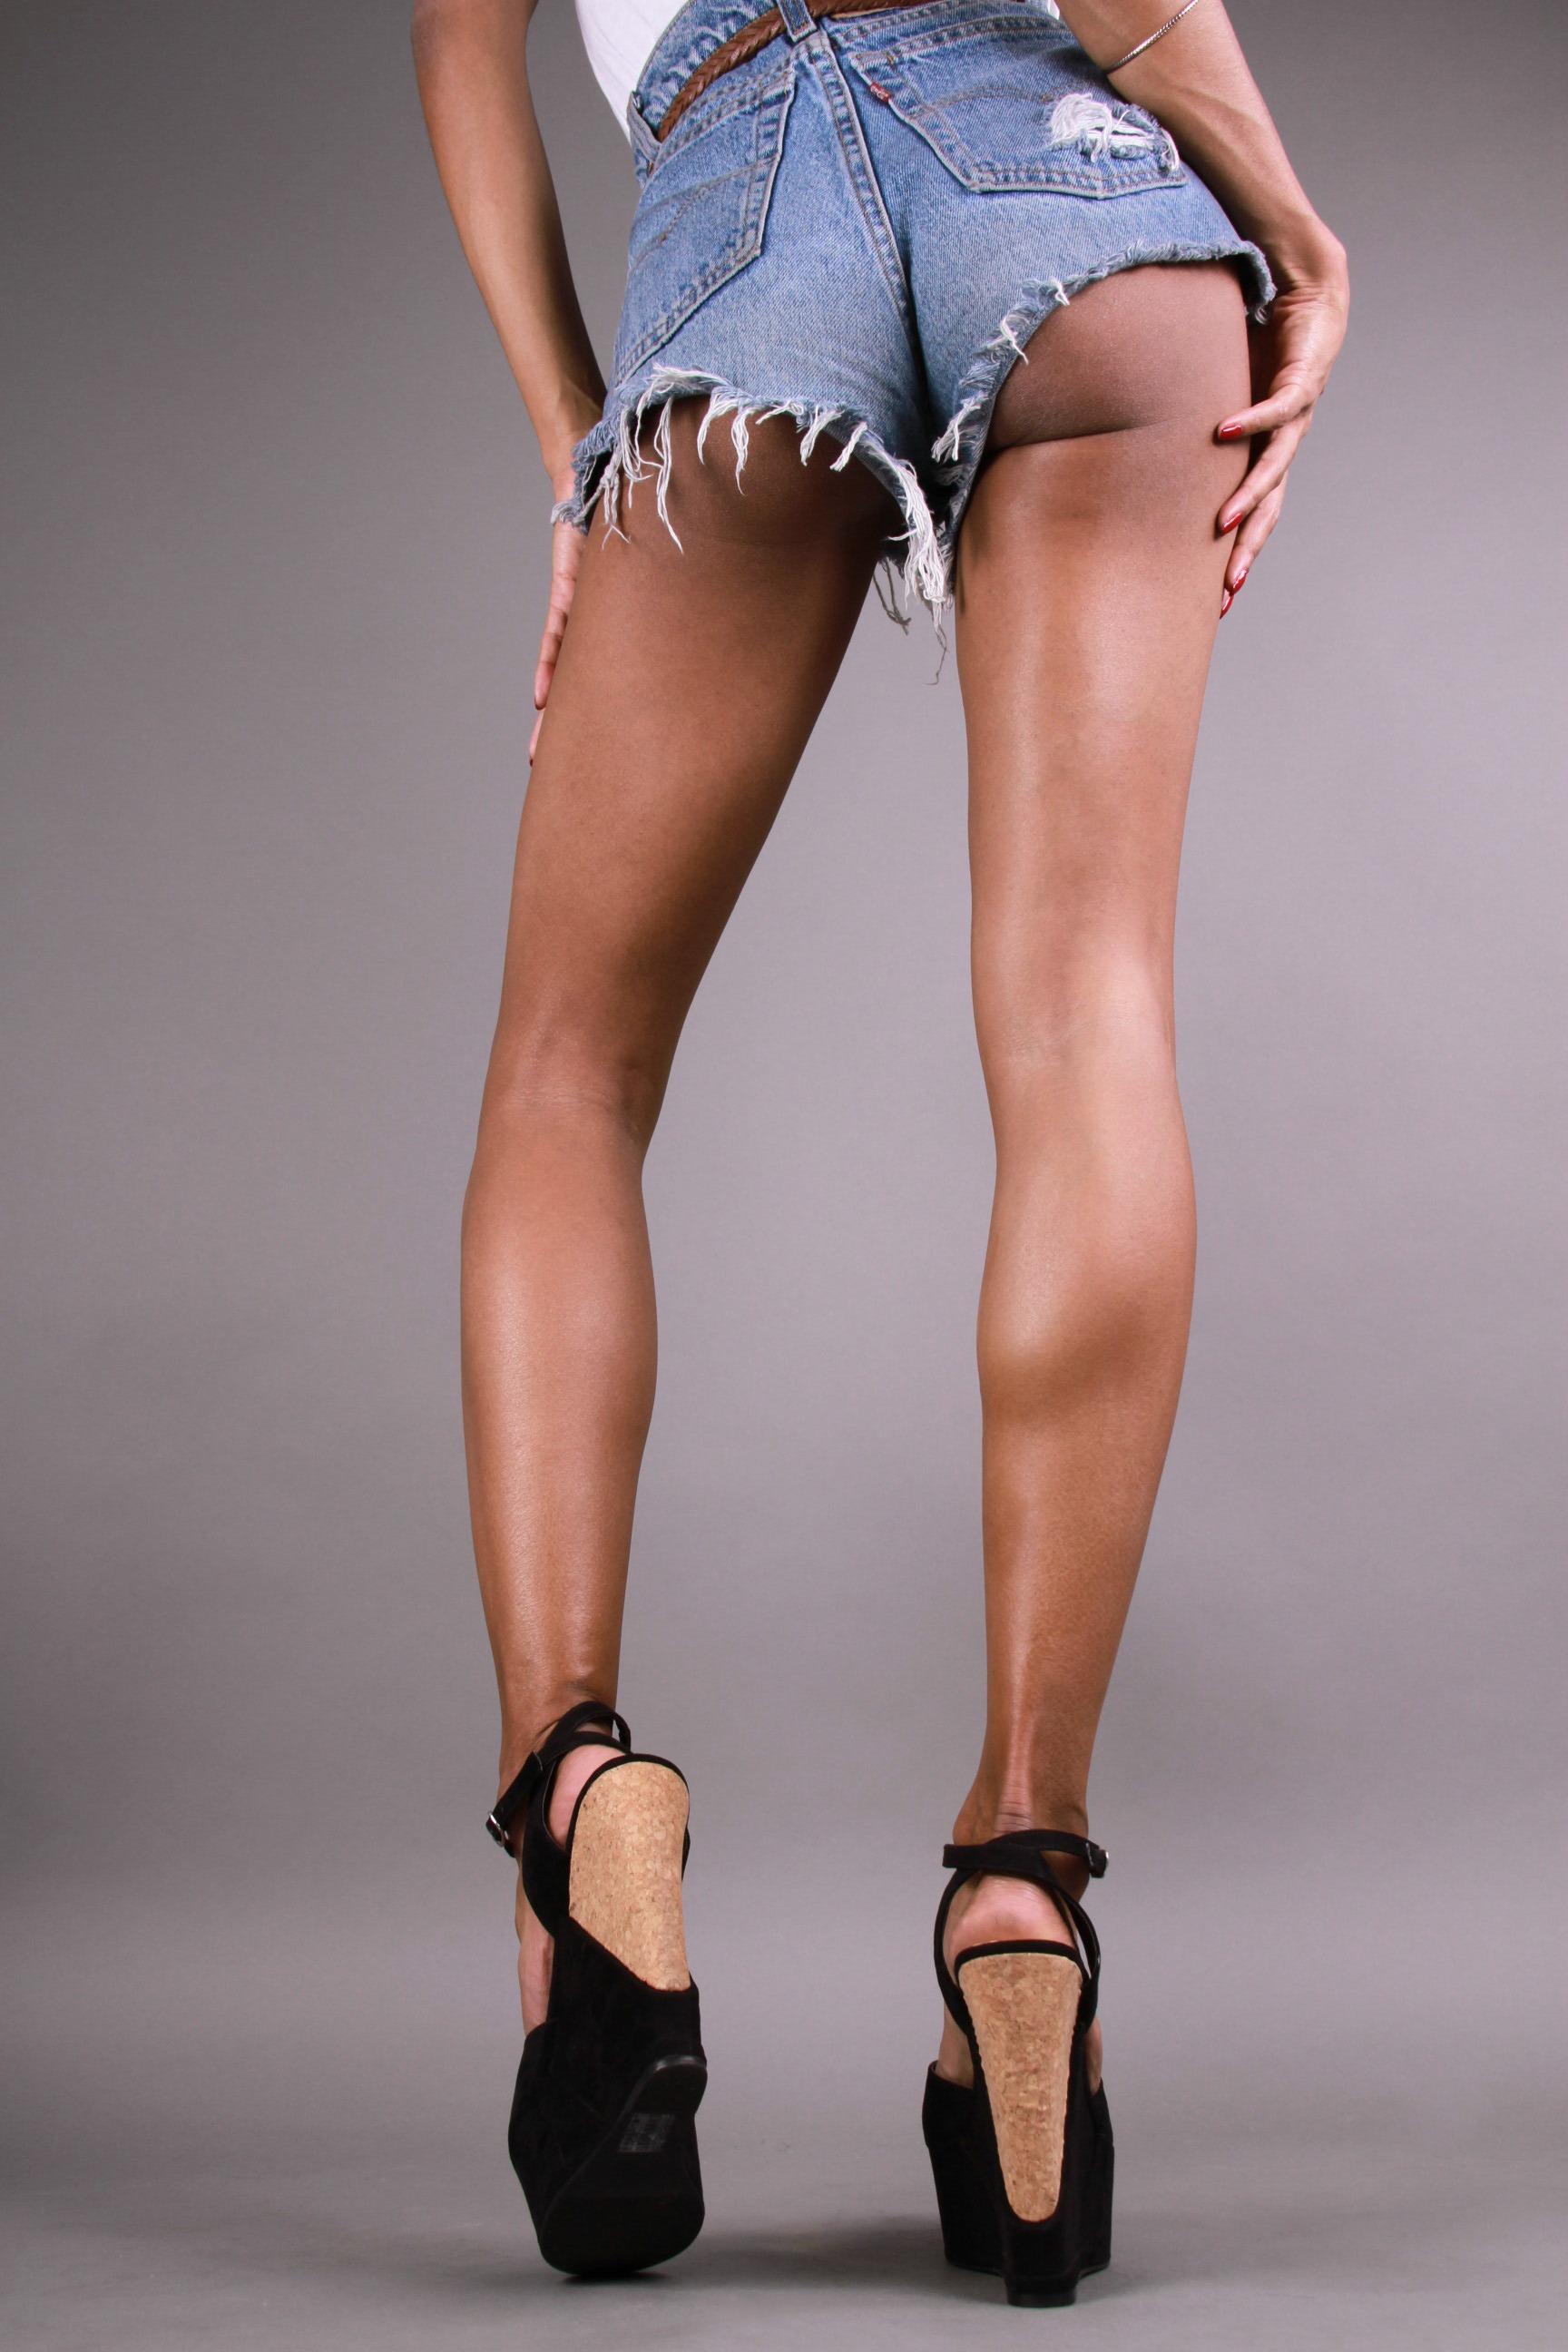 Elizabeth Grullon_Legs5